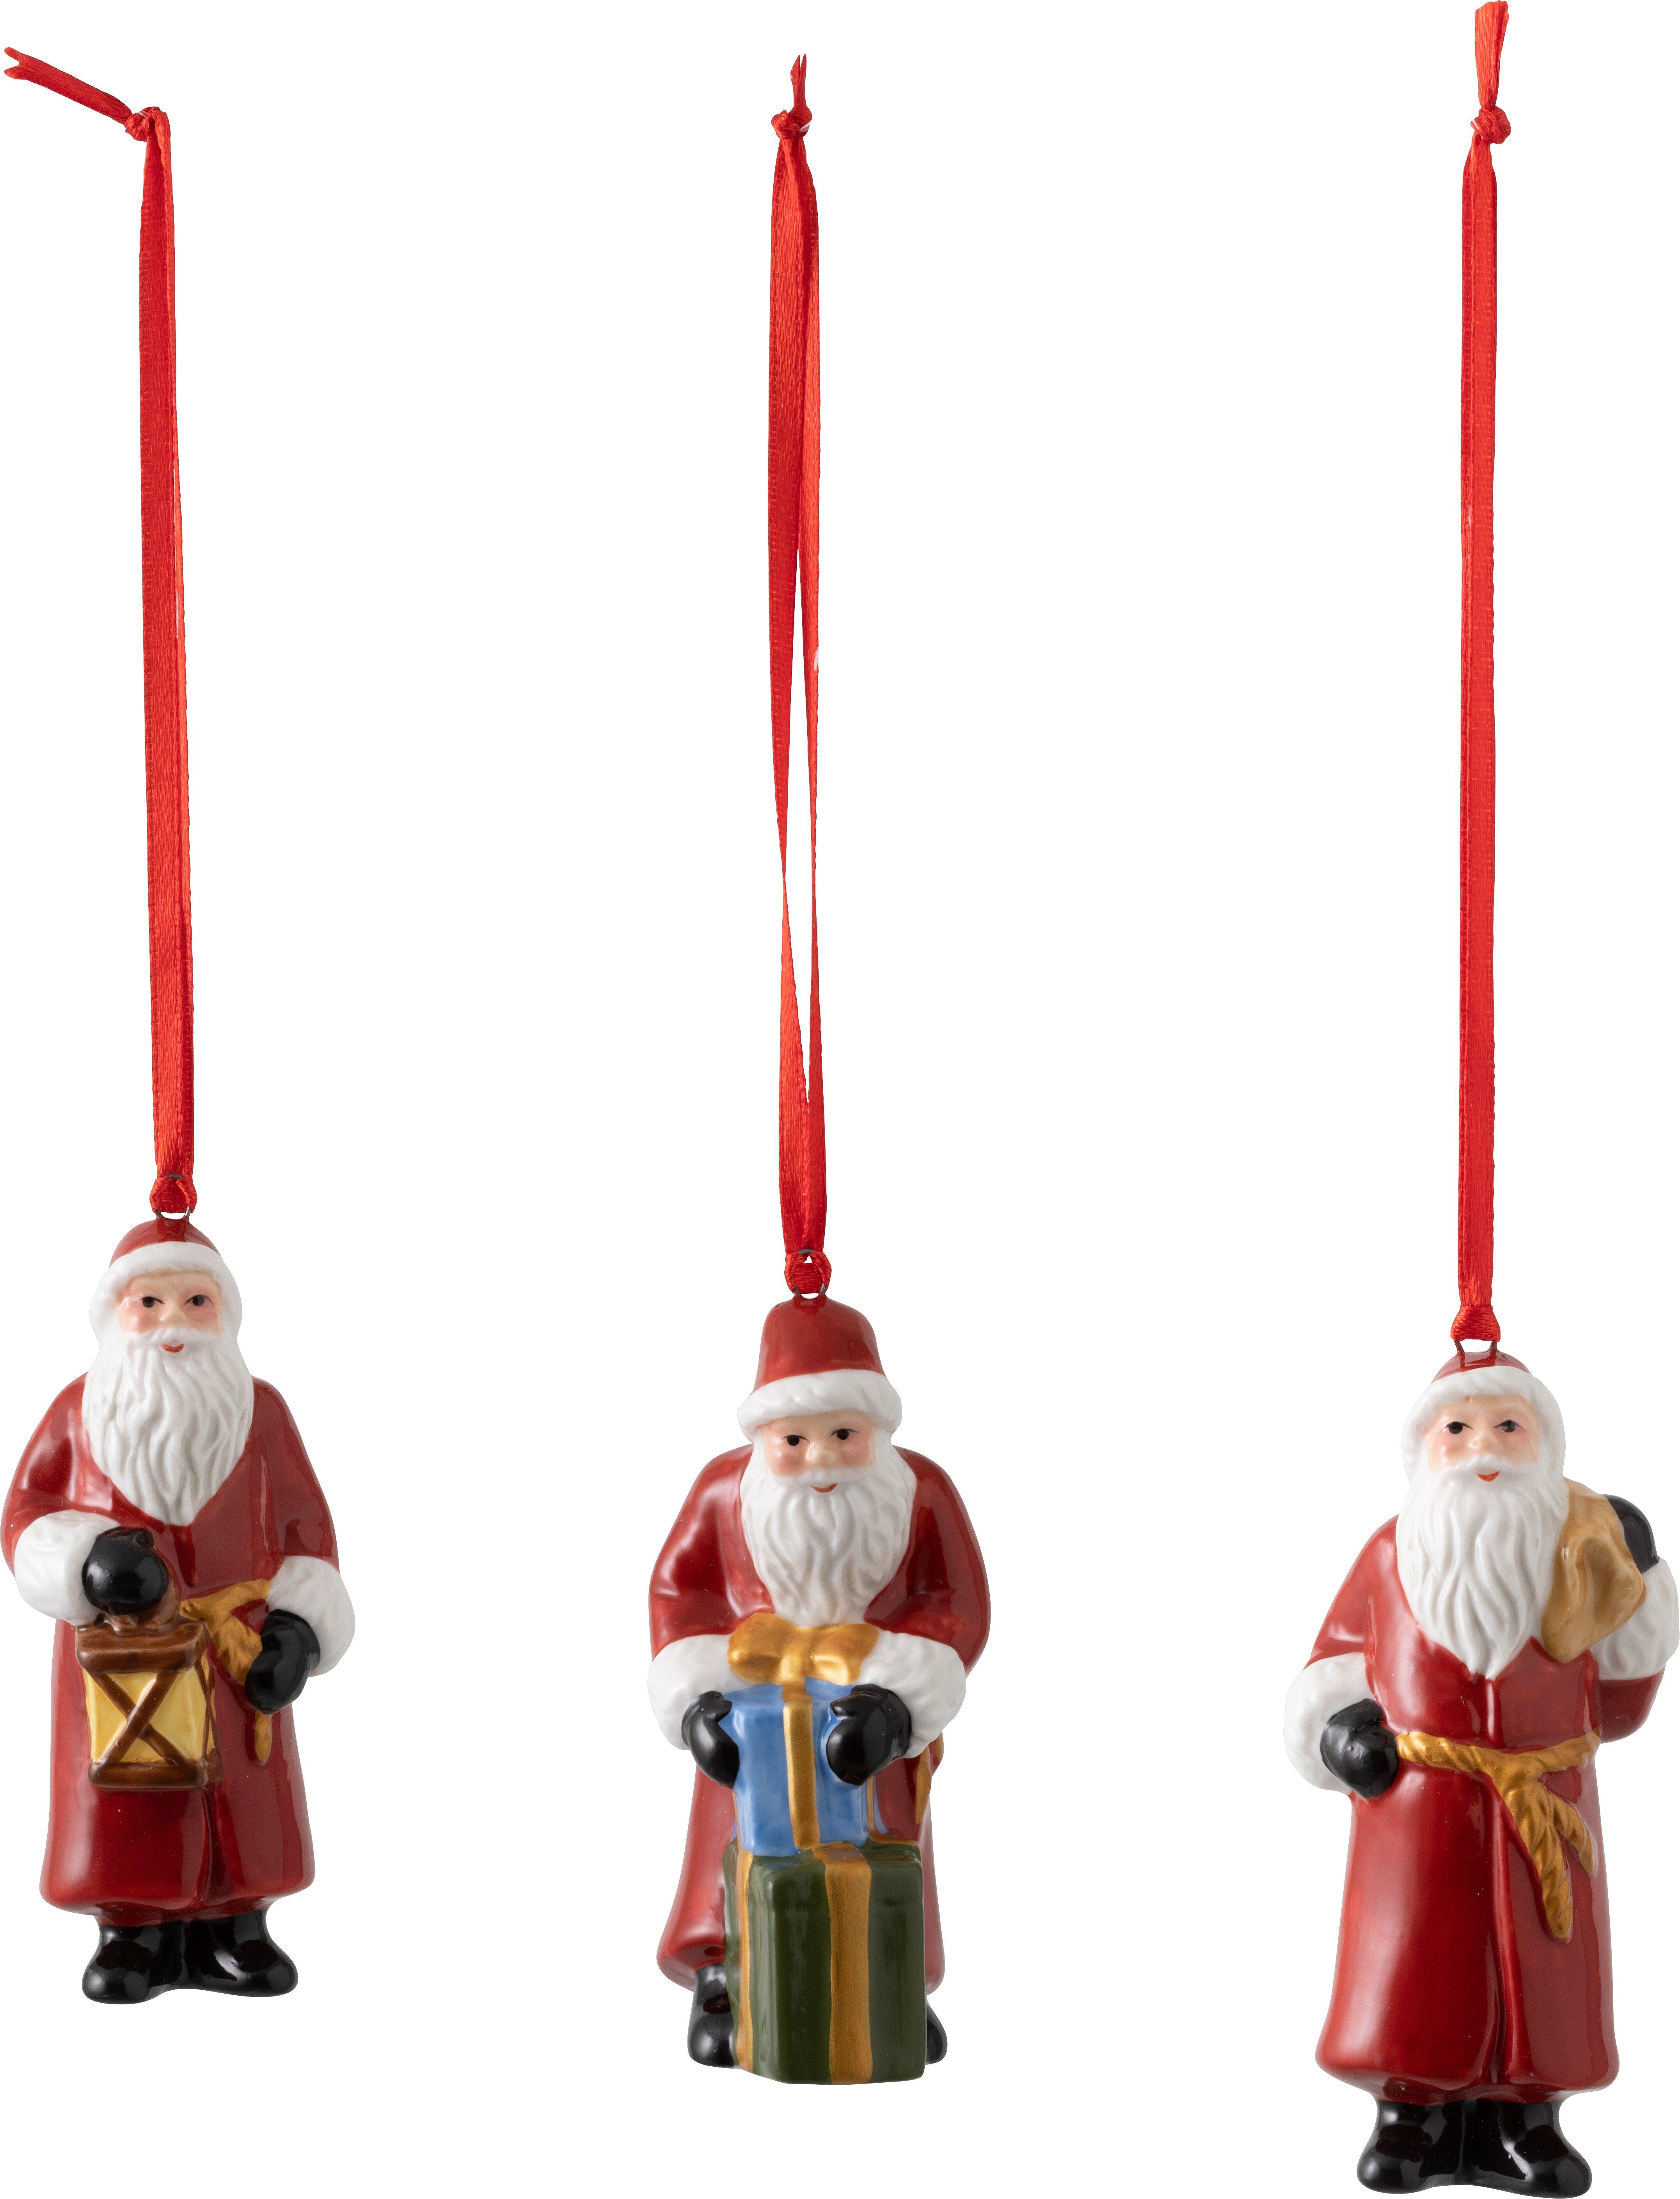 Hanging Figurines Santa Claus Christmas Ornaments You Ll Love In 2021 Wayfair